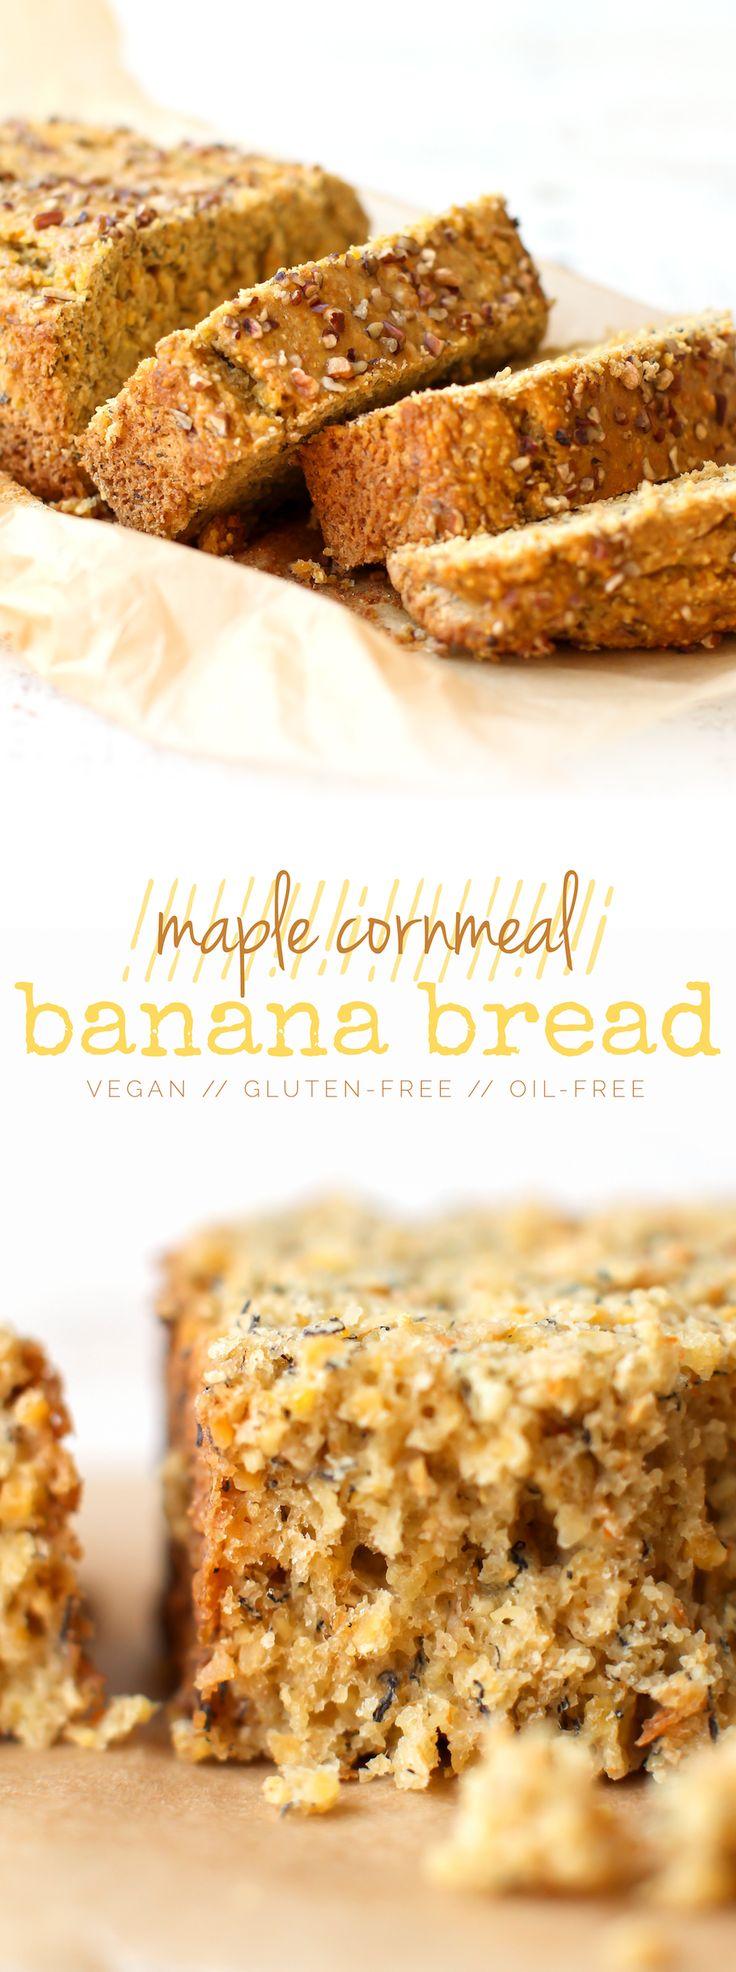 Maple Cornmeal Banana Bread #glutenfree #vegan #oilfree